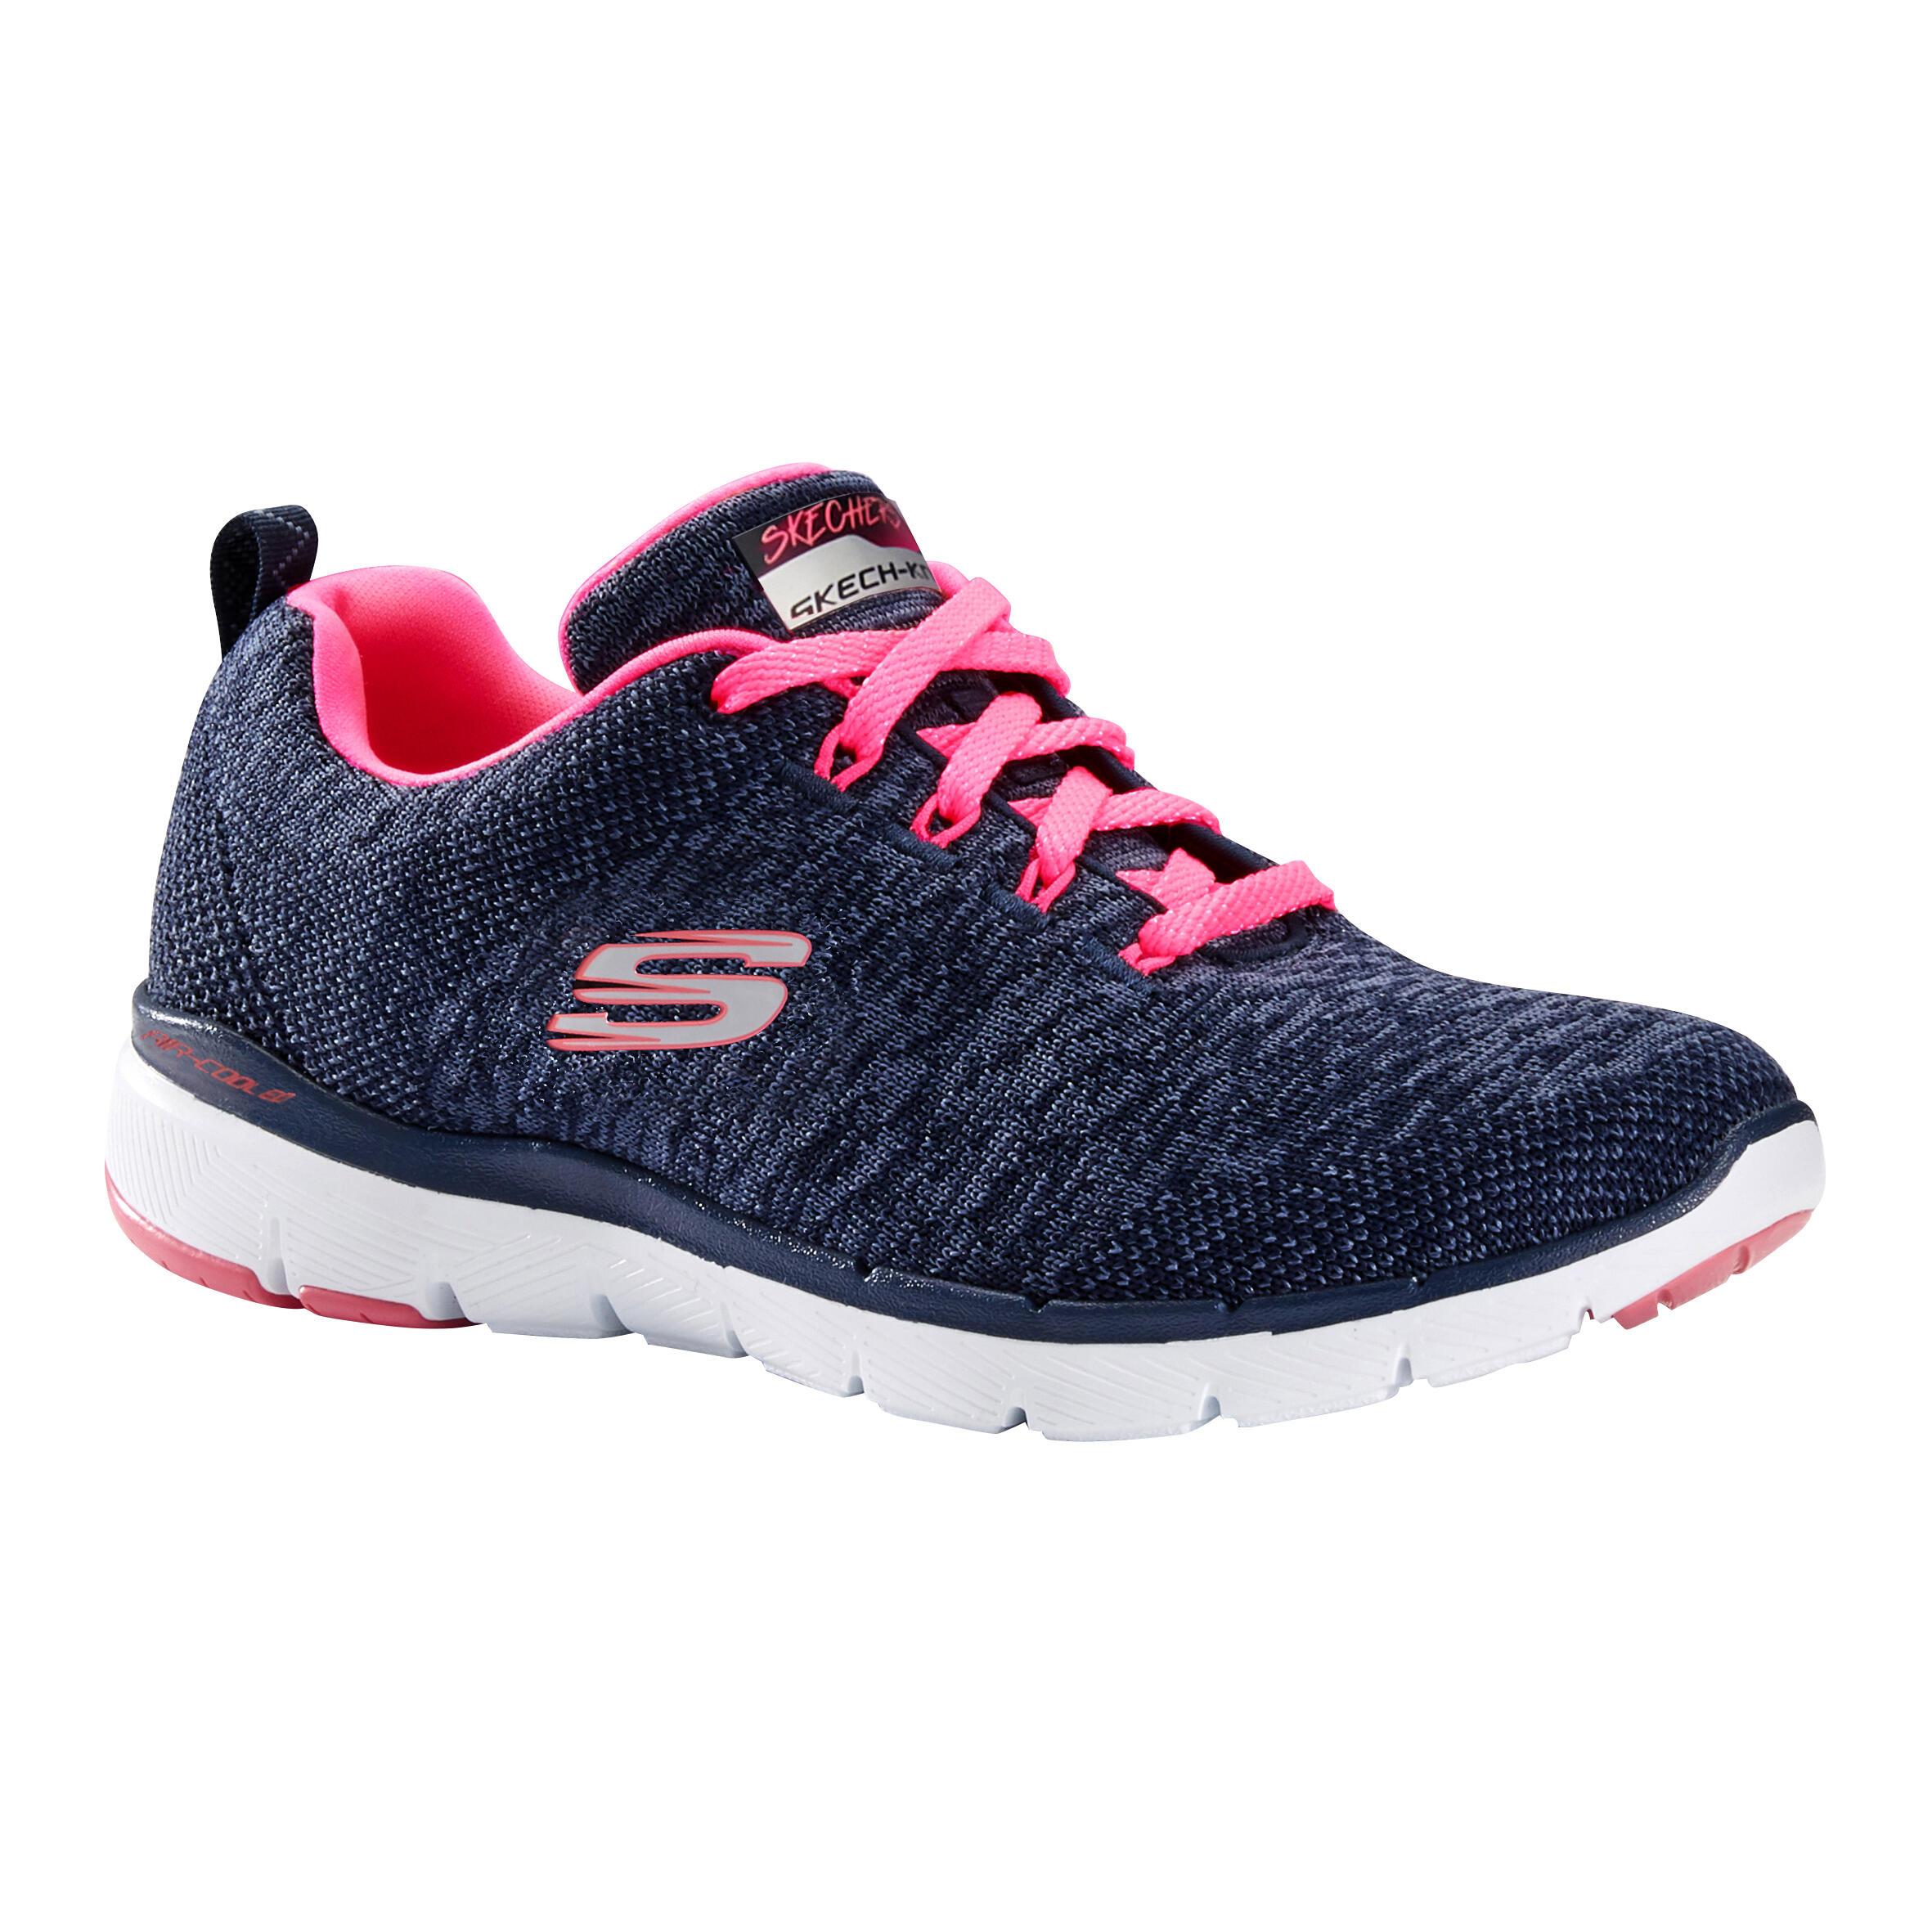 SKECHERS Chaussures marche sportive femme Flex Appeal bleu / rose - SKECHERS - 36